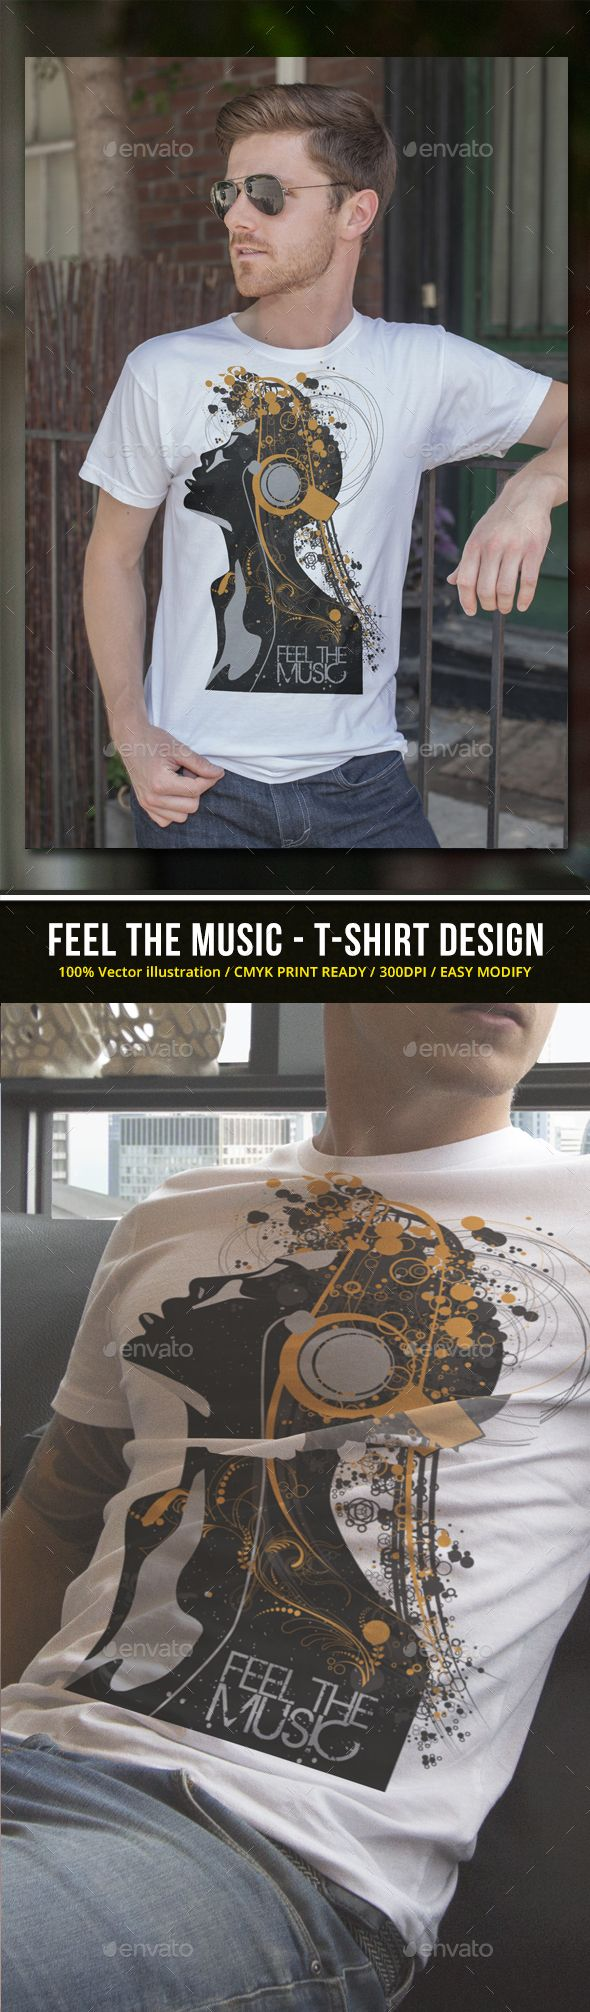 Shirt design eps - Feel The Music T Shirt Design Eps Template Music T Shirt